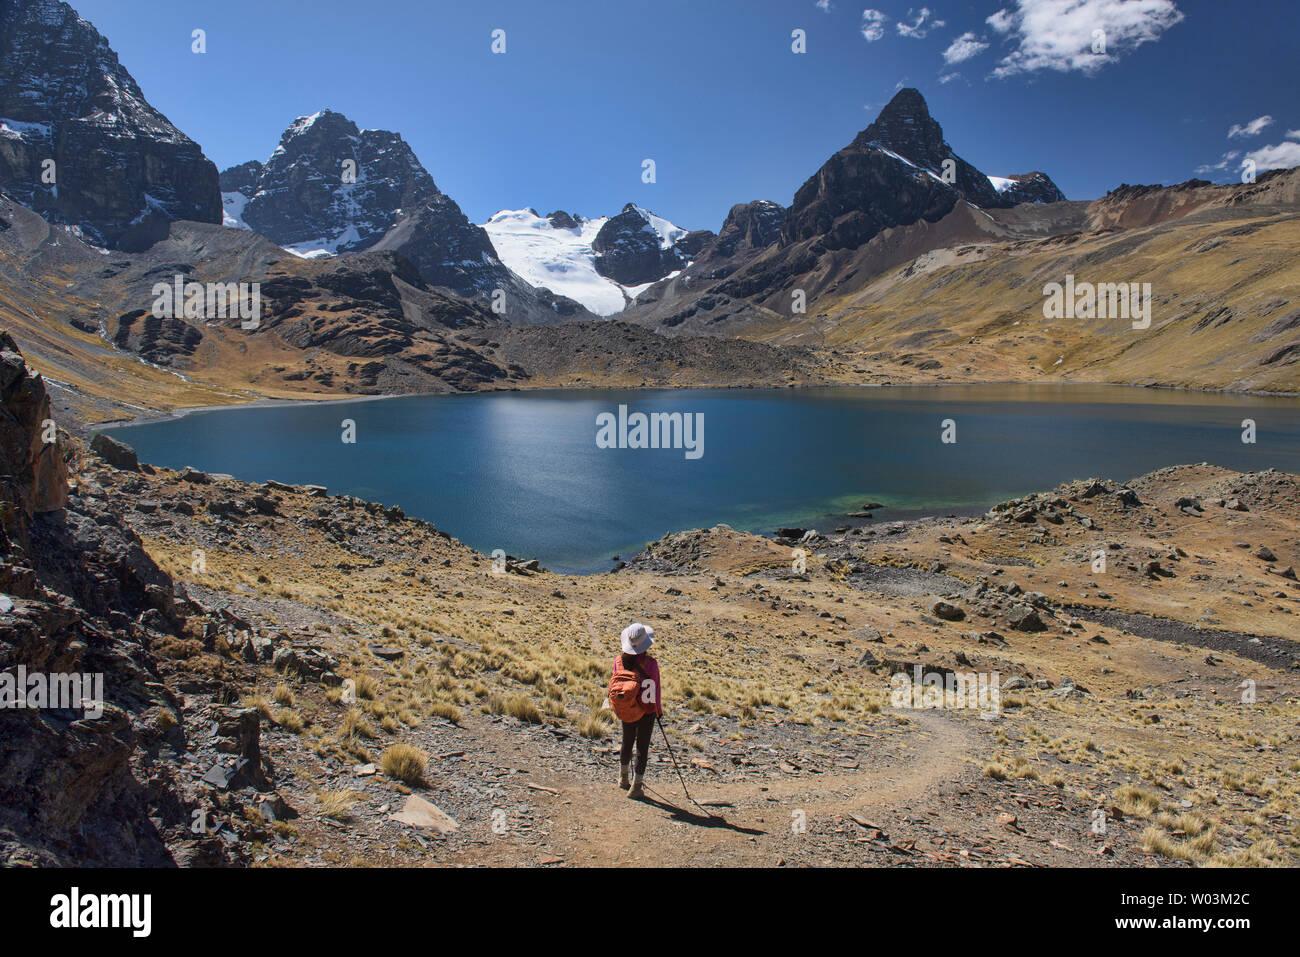 Stunning alpine scenery at Chiar Khota Lake and Condoriri Basecamp along the Cordillera Real Traverse, Bolivia - Stock Image